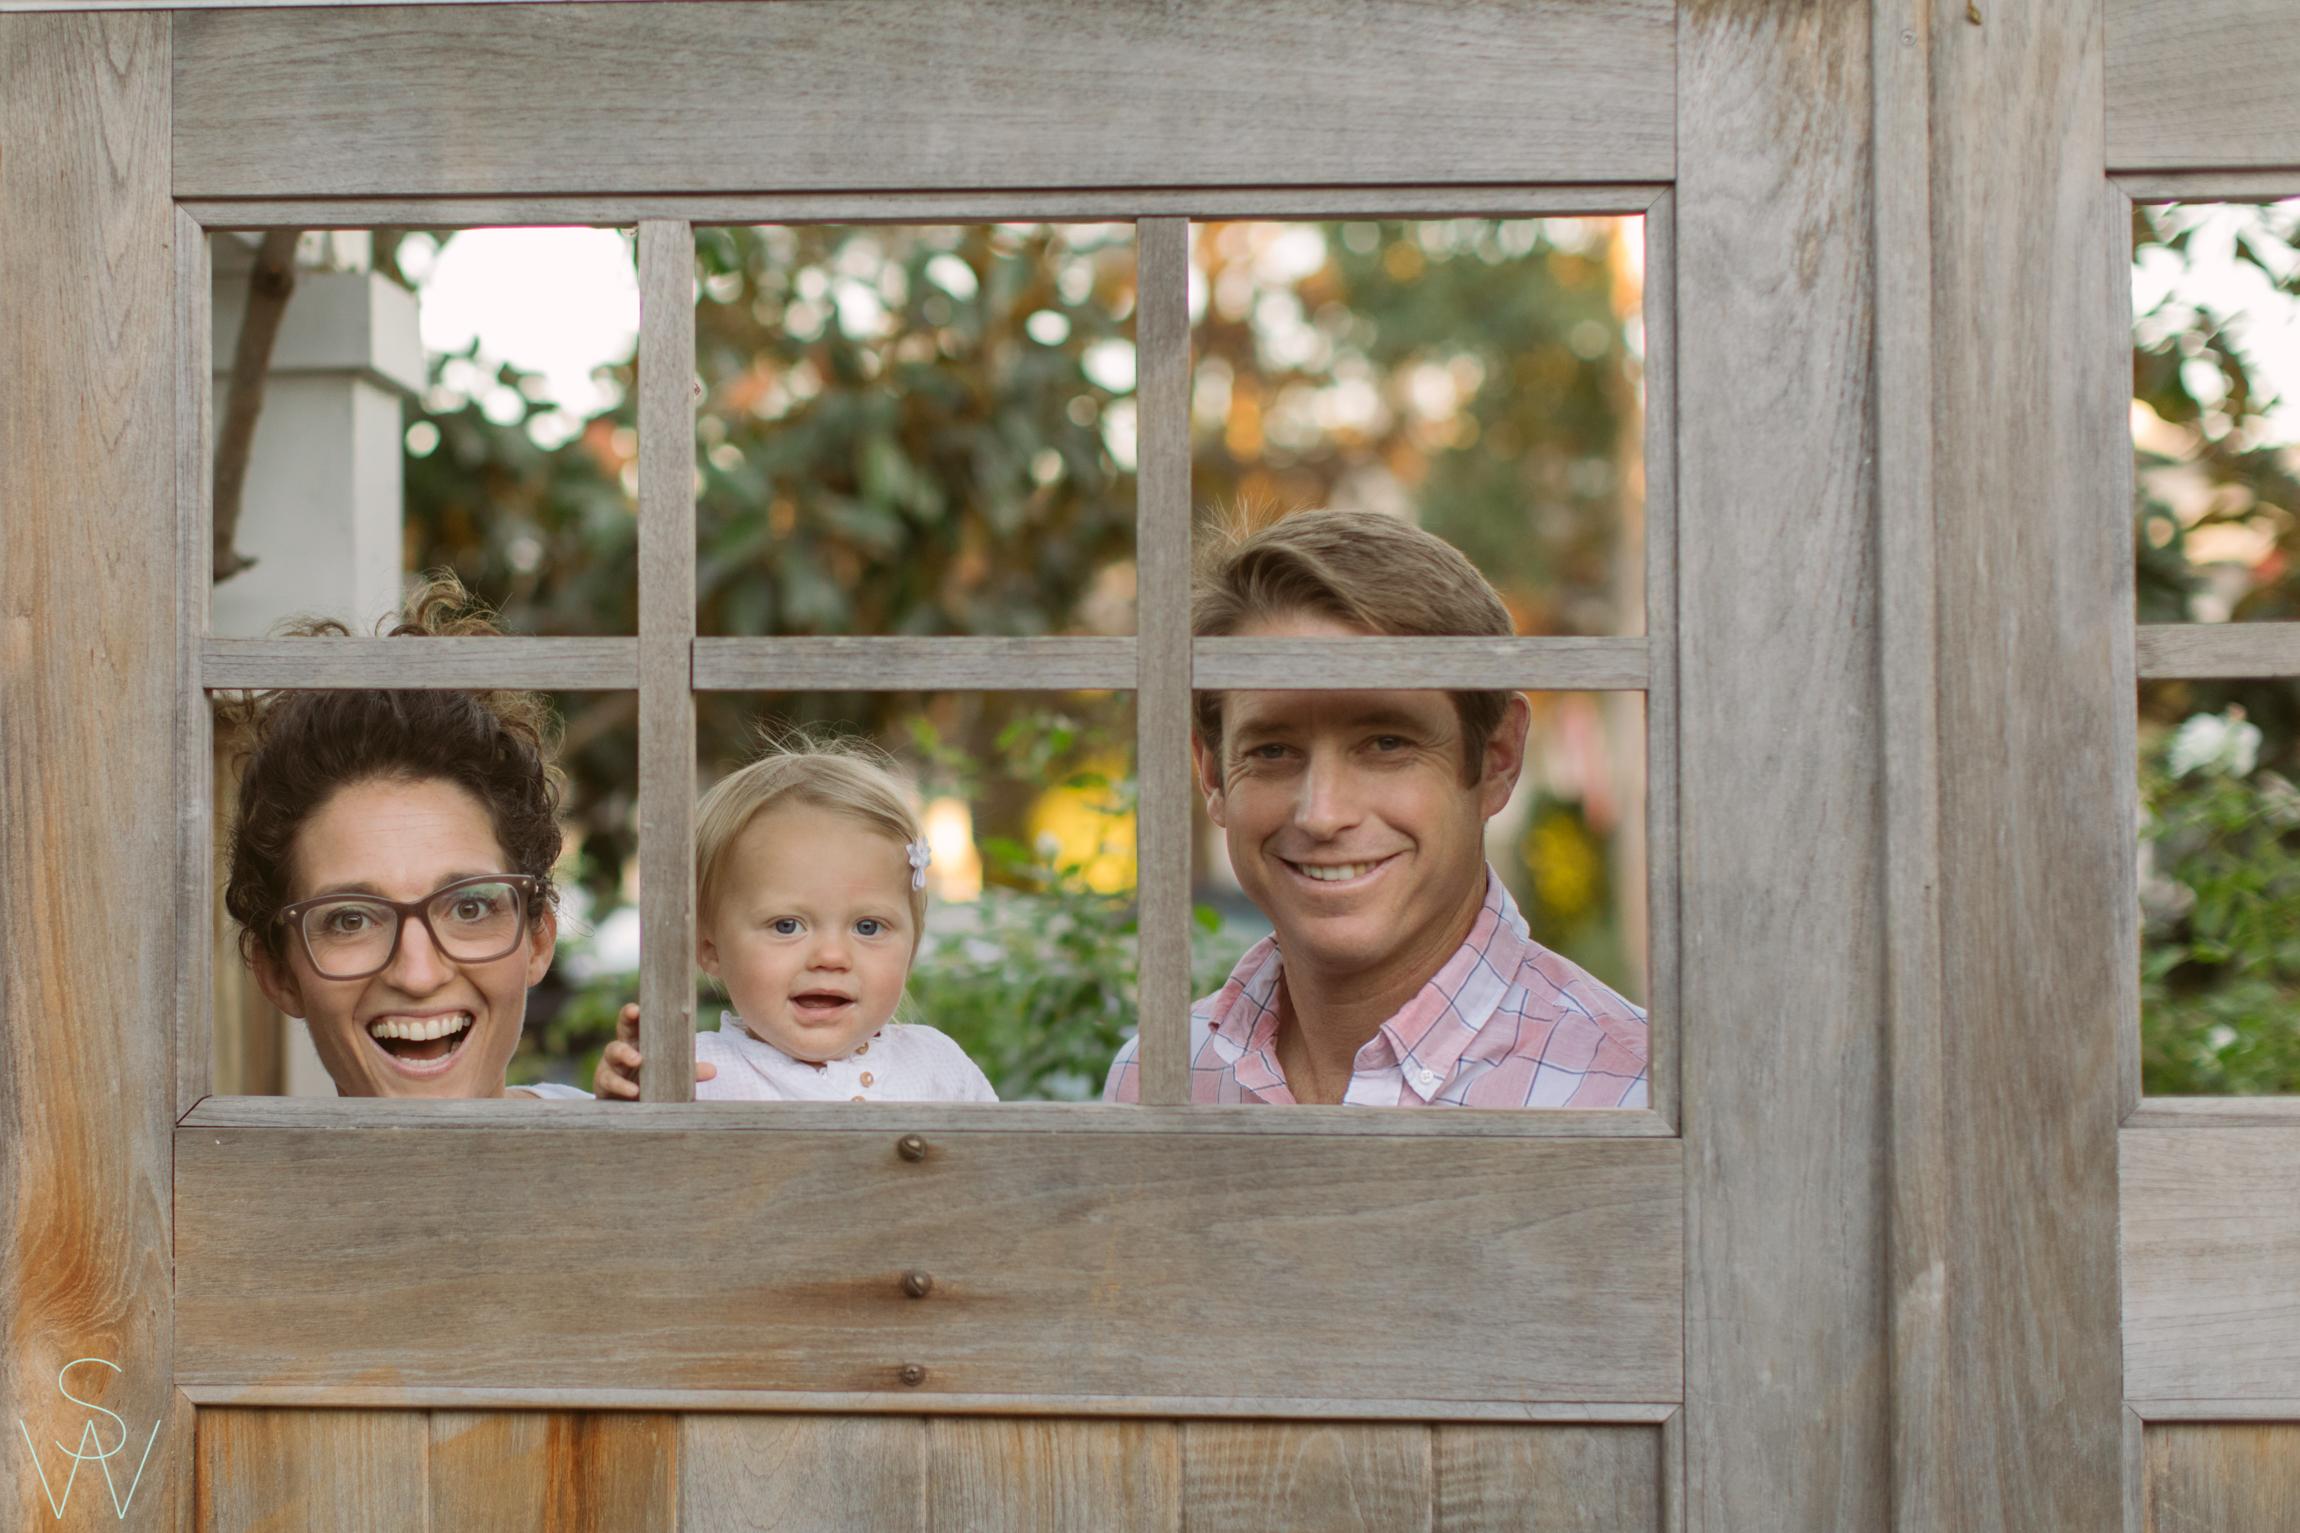 coronado.family.photography.shewanders-10.jpg